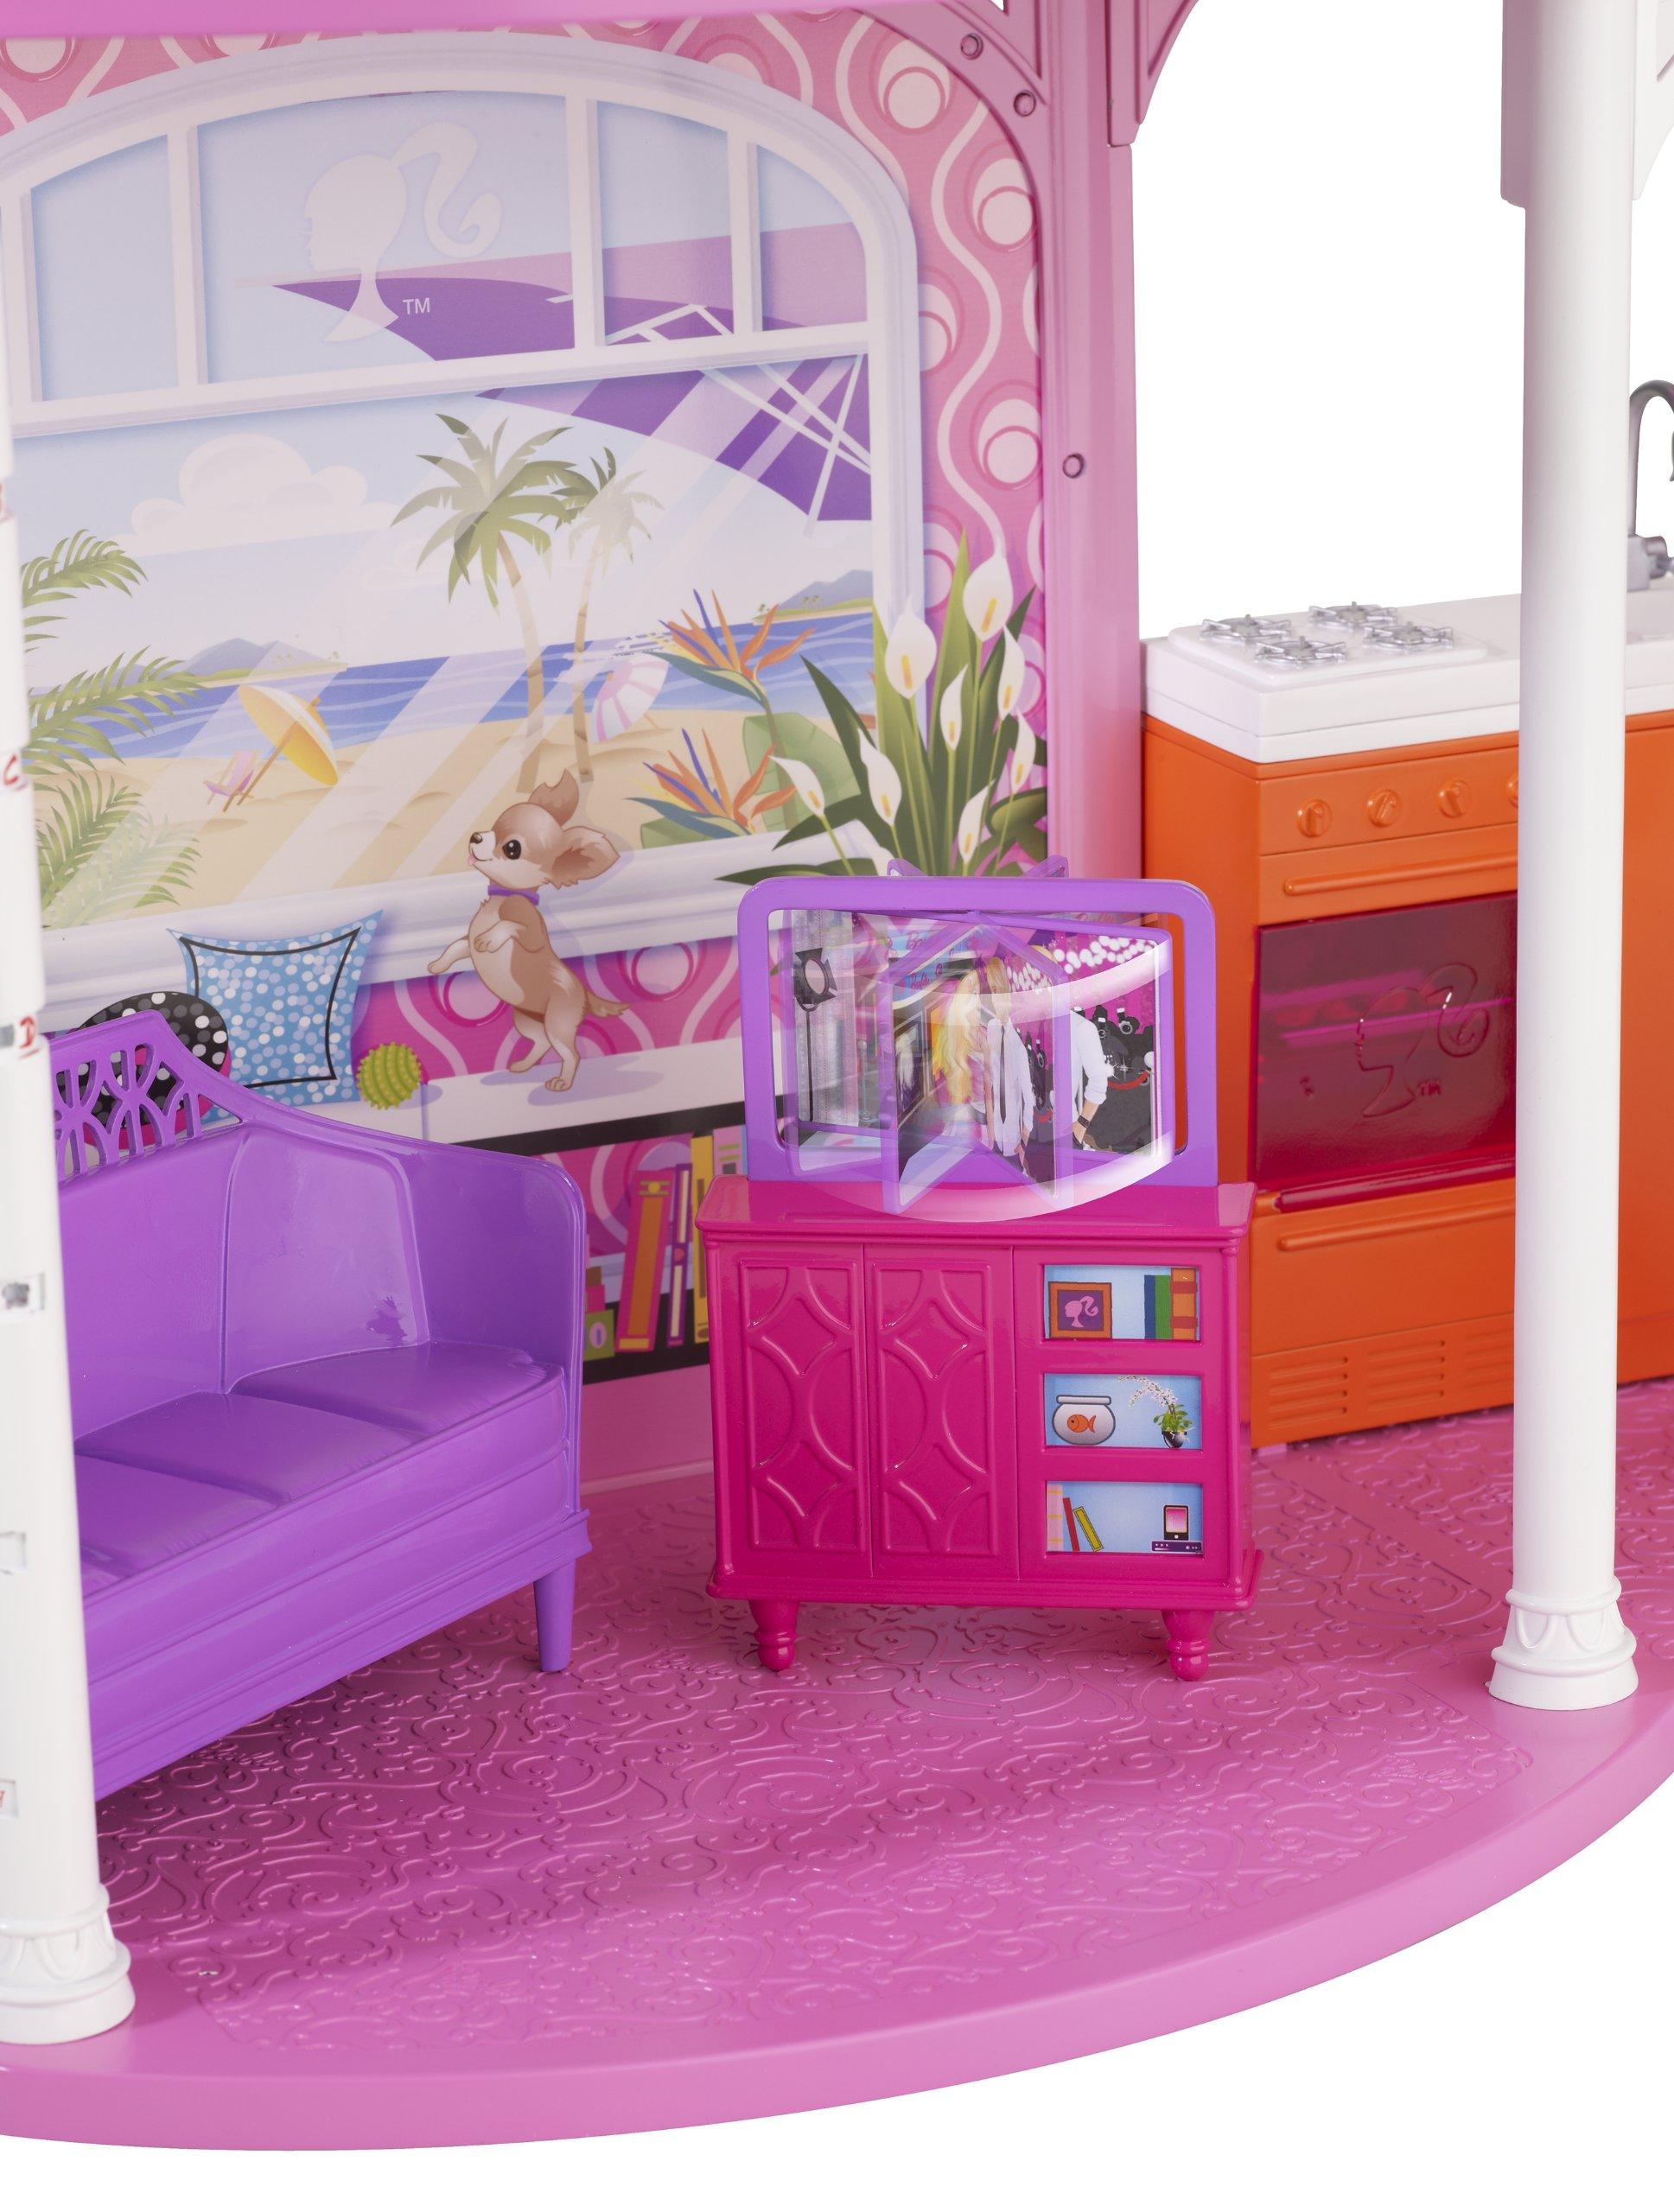 Barbie 2-Story Beach House by Barbie (Image #11)